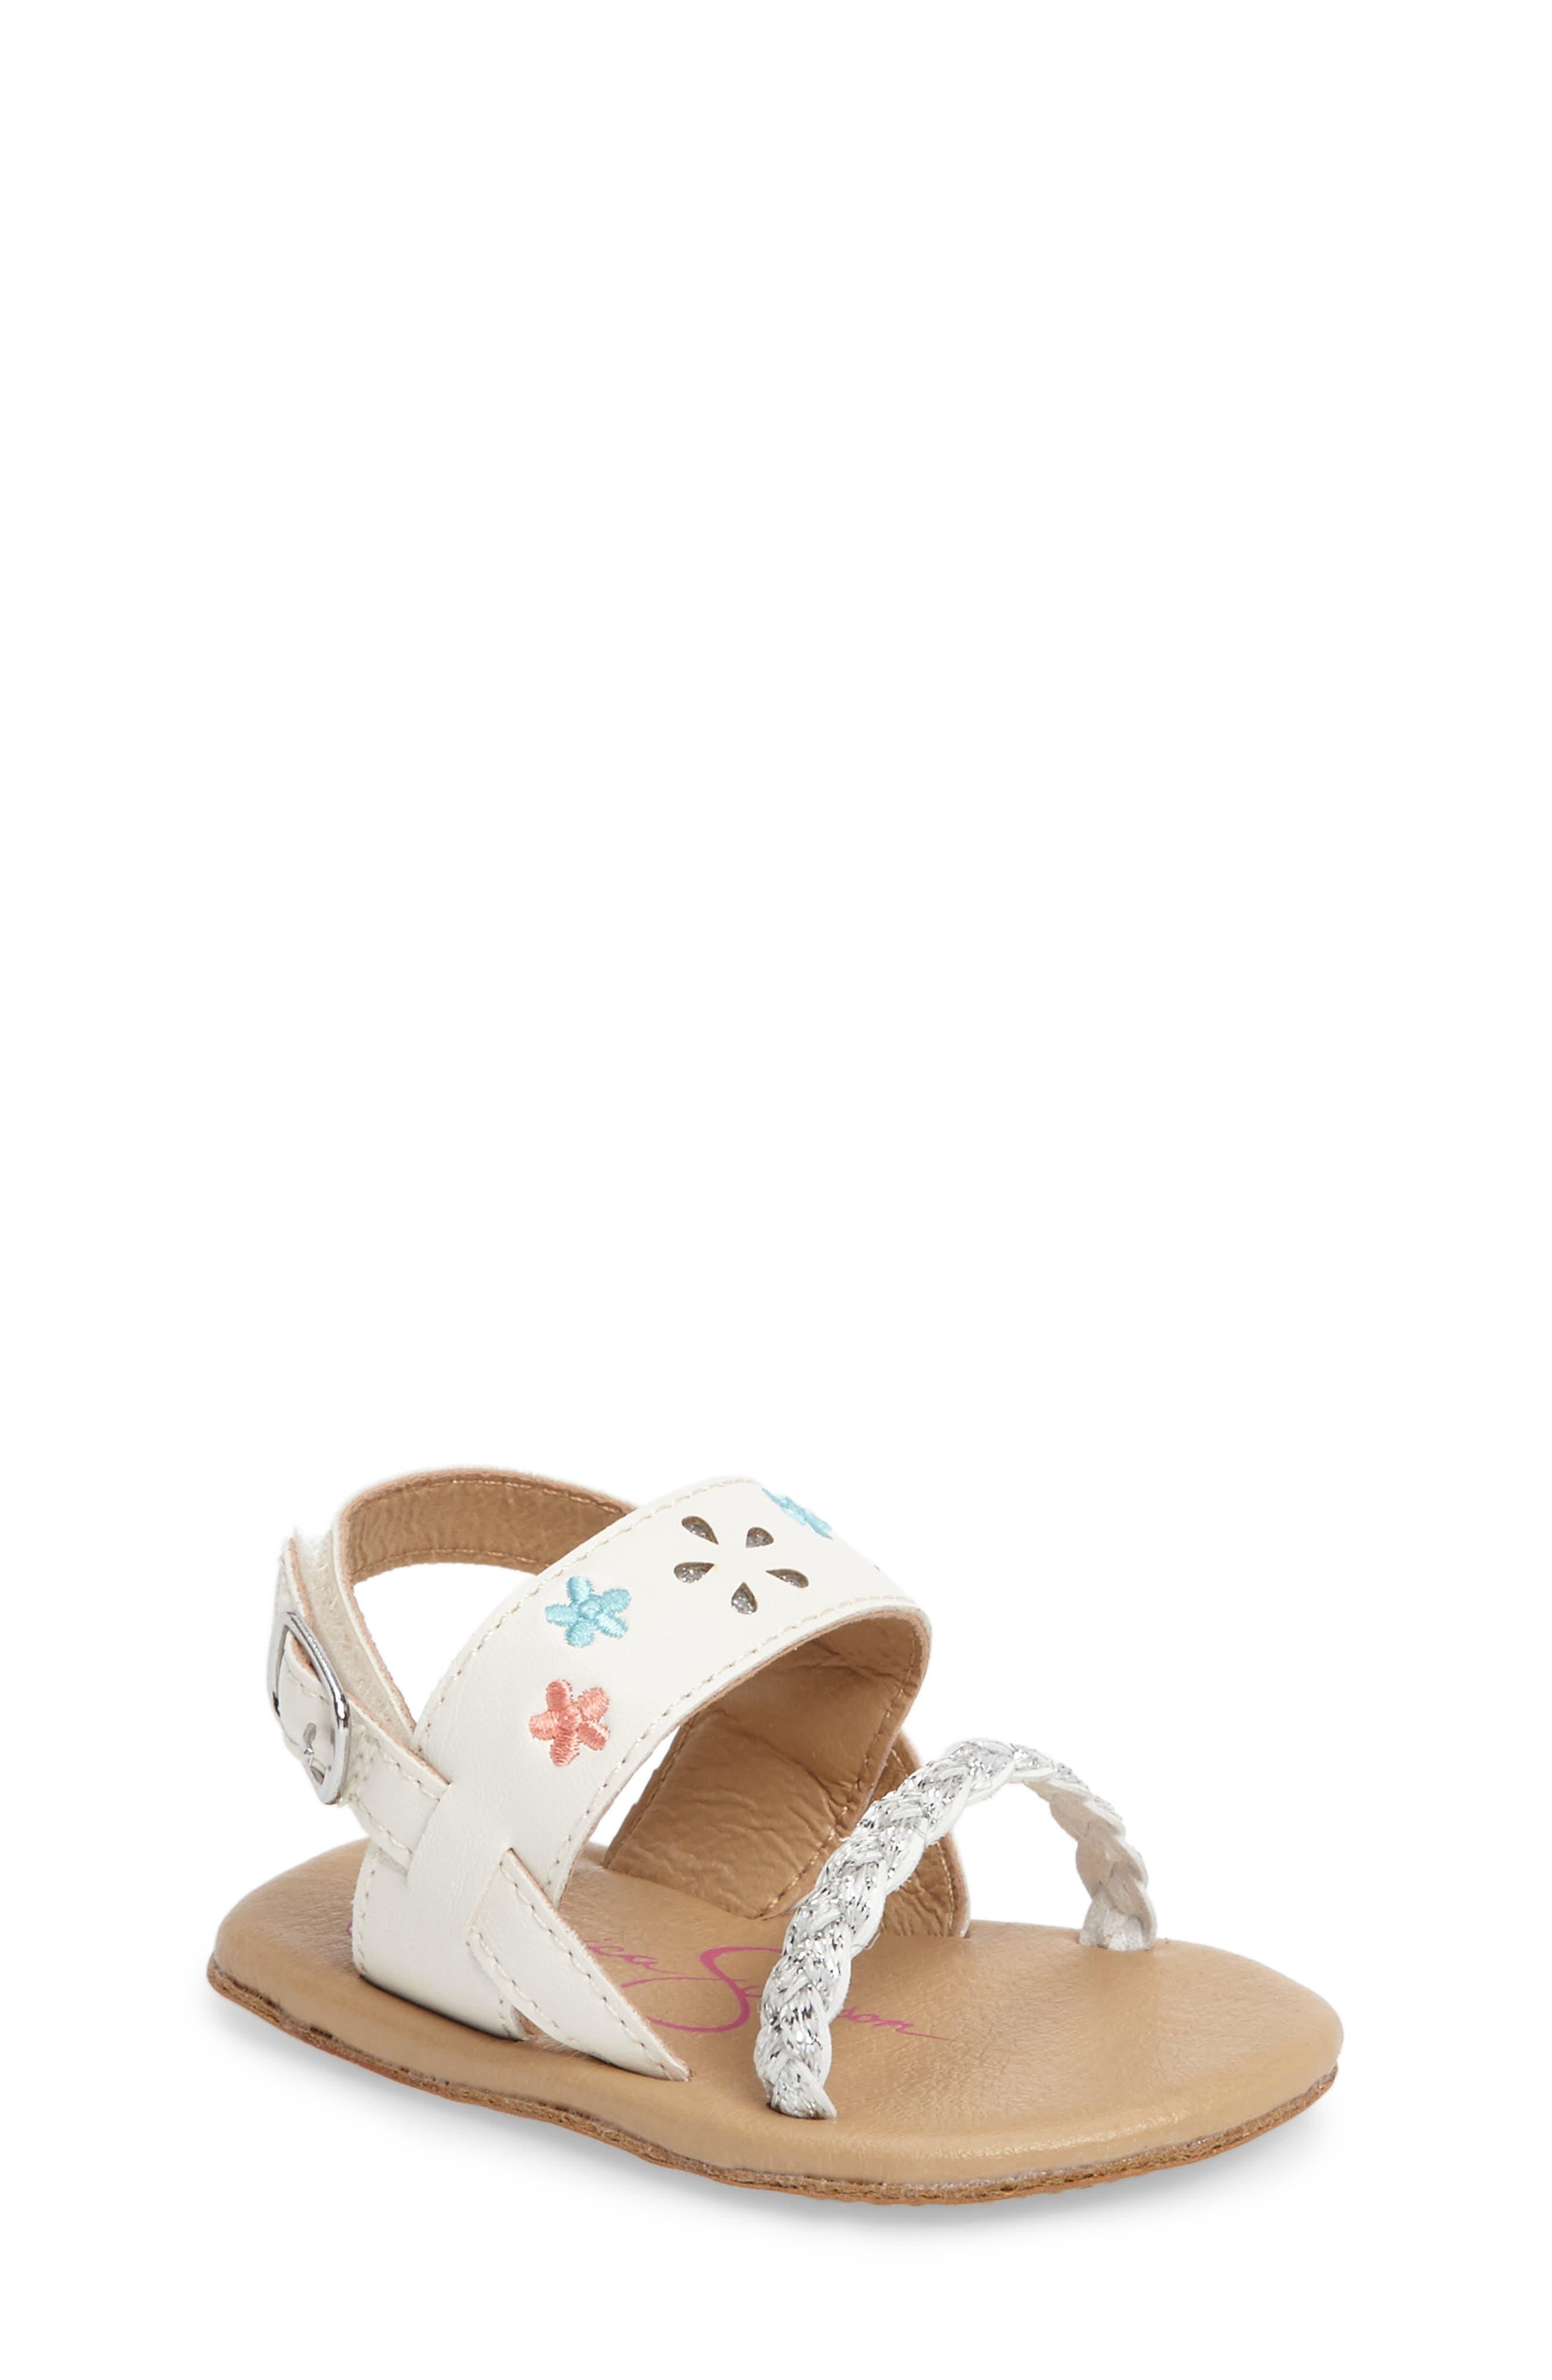 JESSICA SIMPSON Embellished Sandal